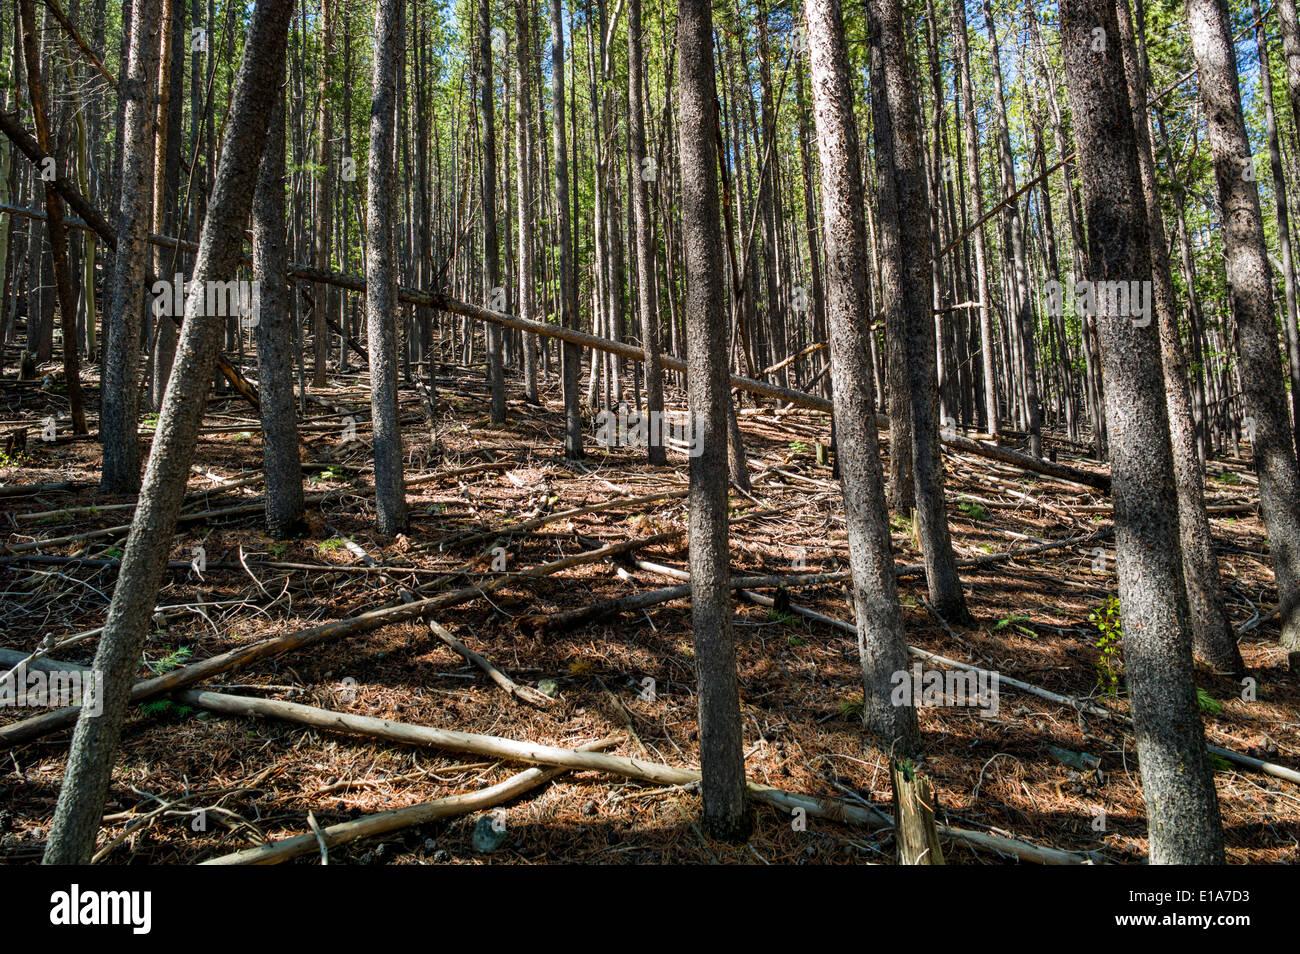 Grove of pine trees, Bear Creek, Rainbow Trail, Colorado, USA - Stock Image